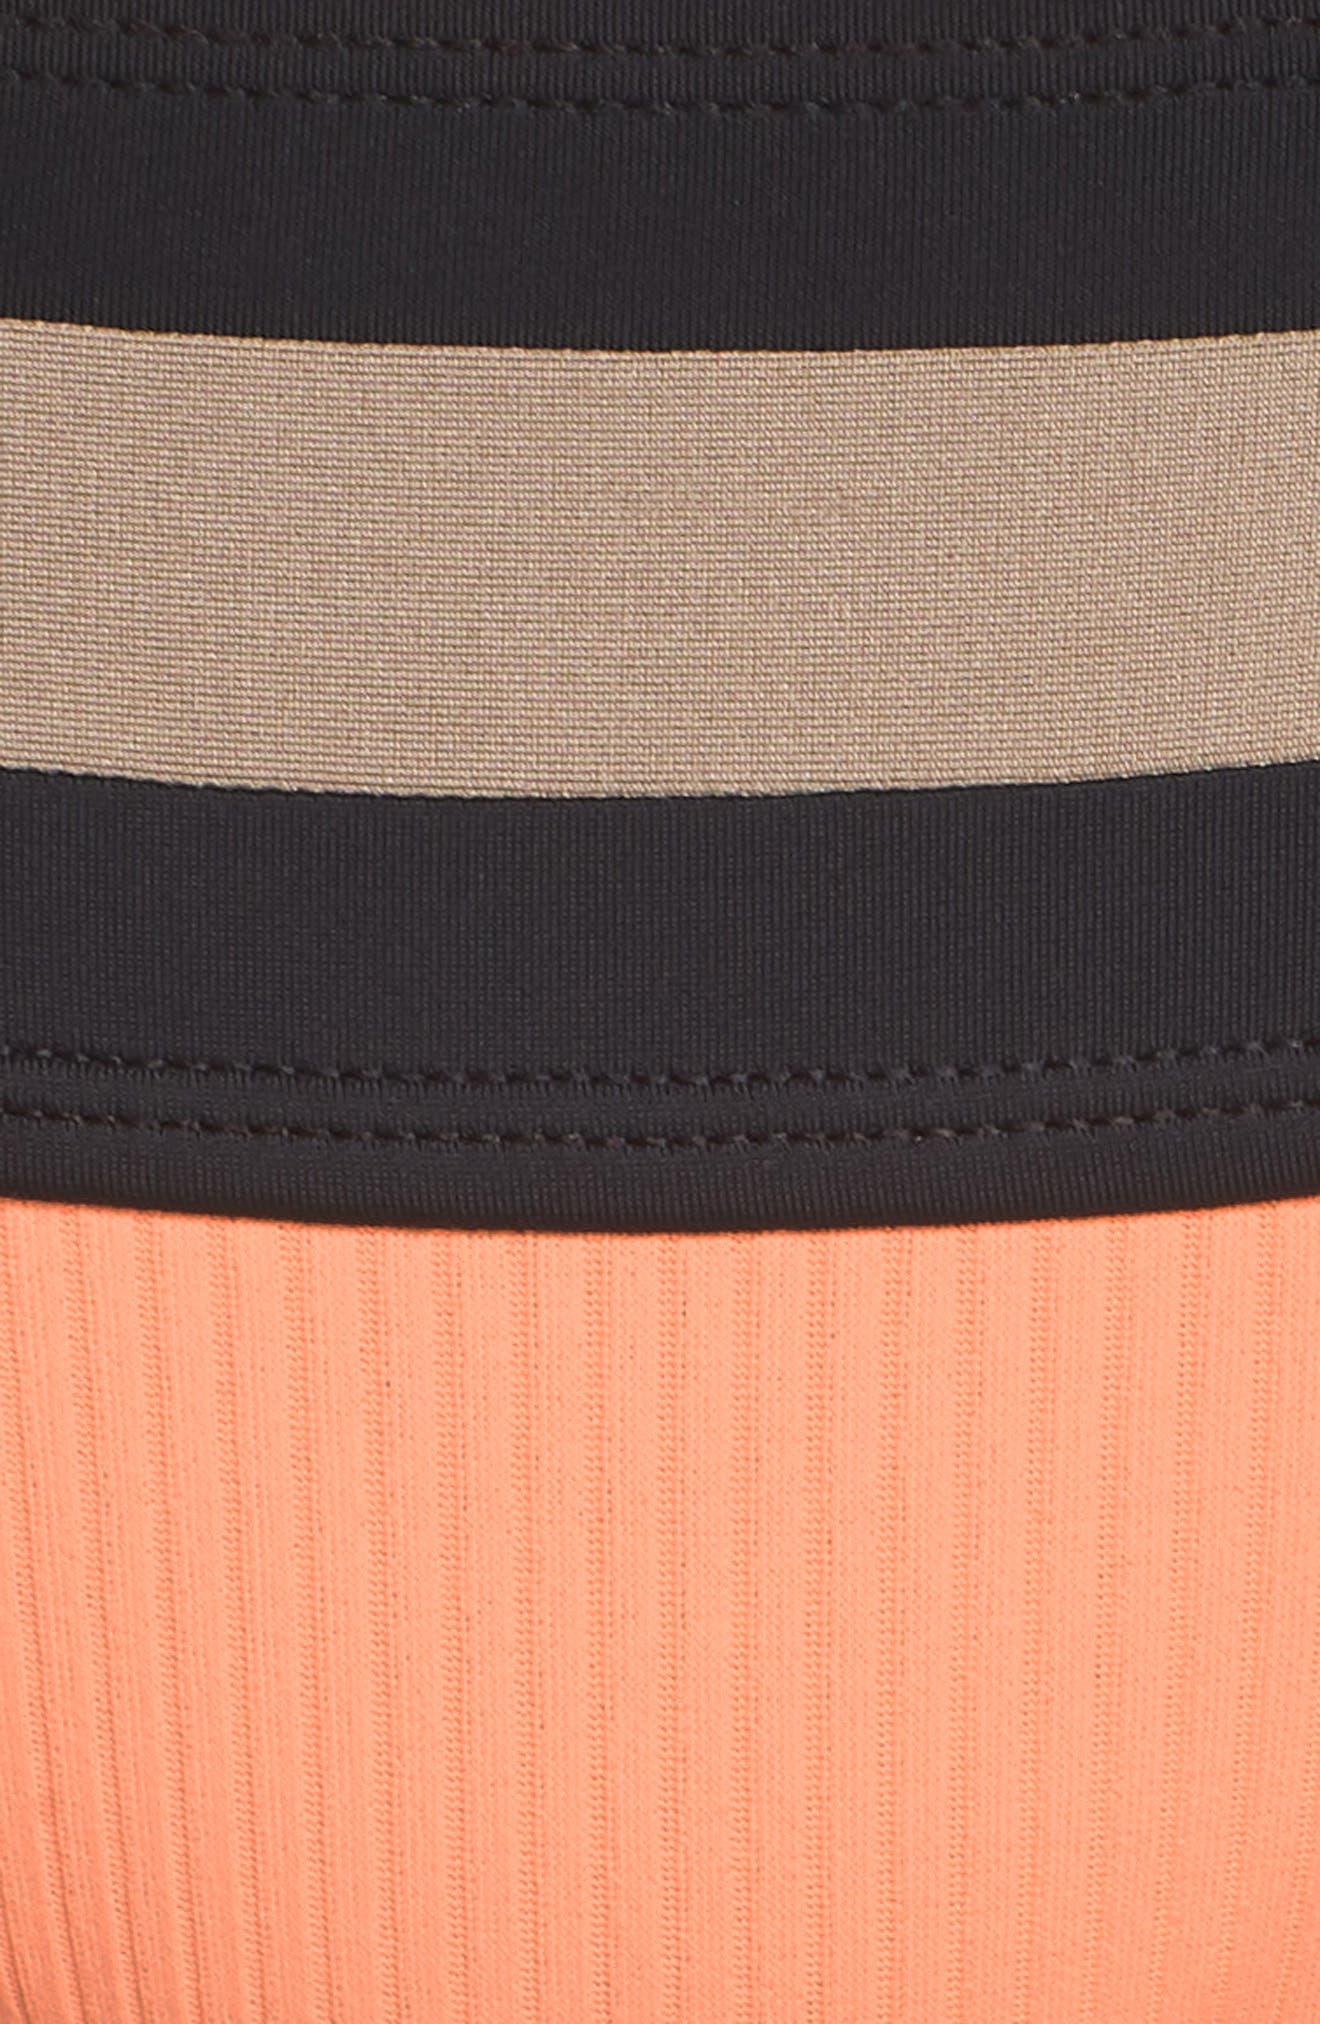 Banded Bikini Bottoms,                             Alternate thumbnail 8, color,                             Sandstone